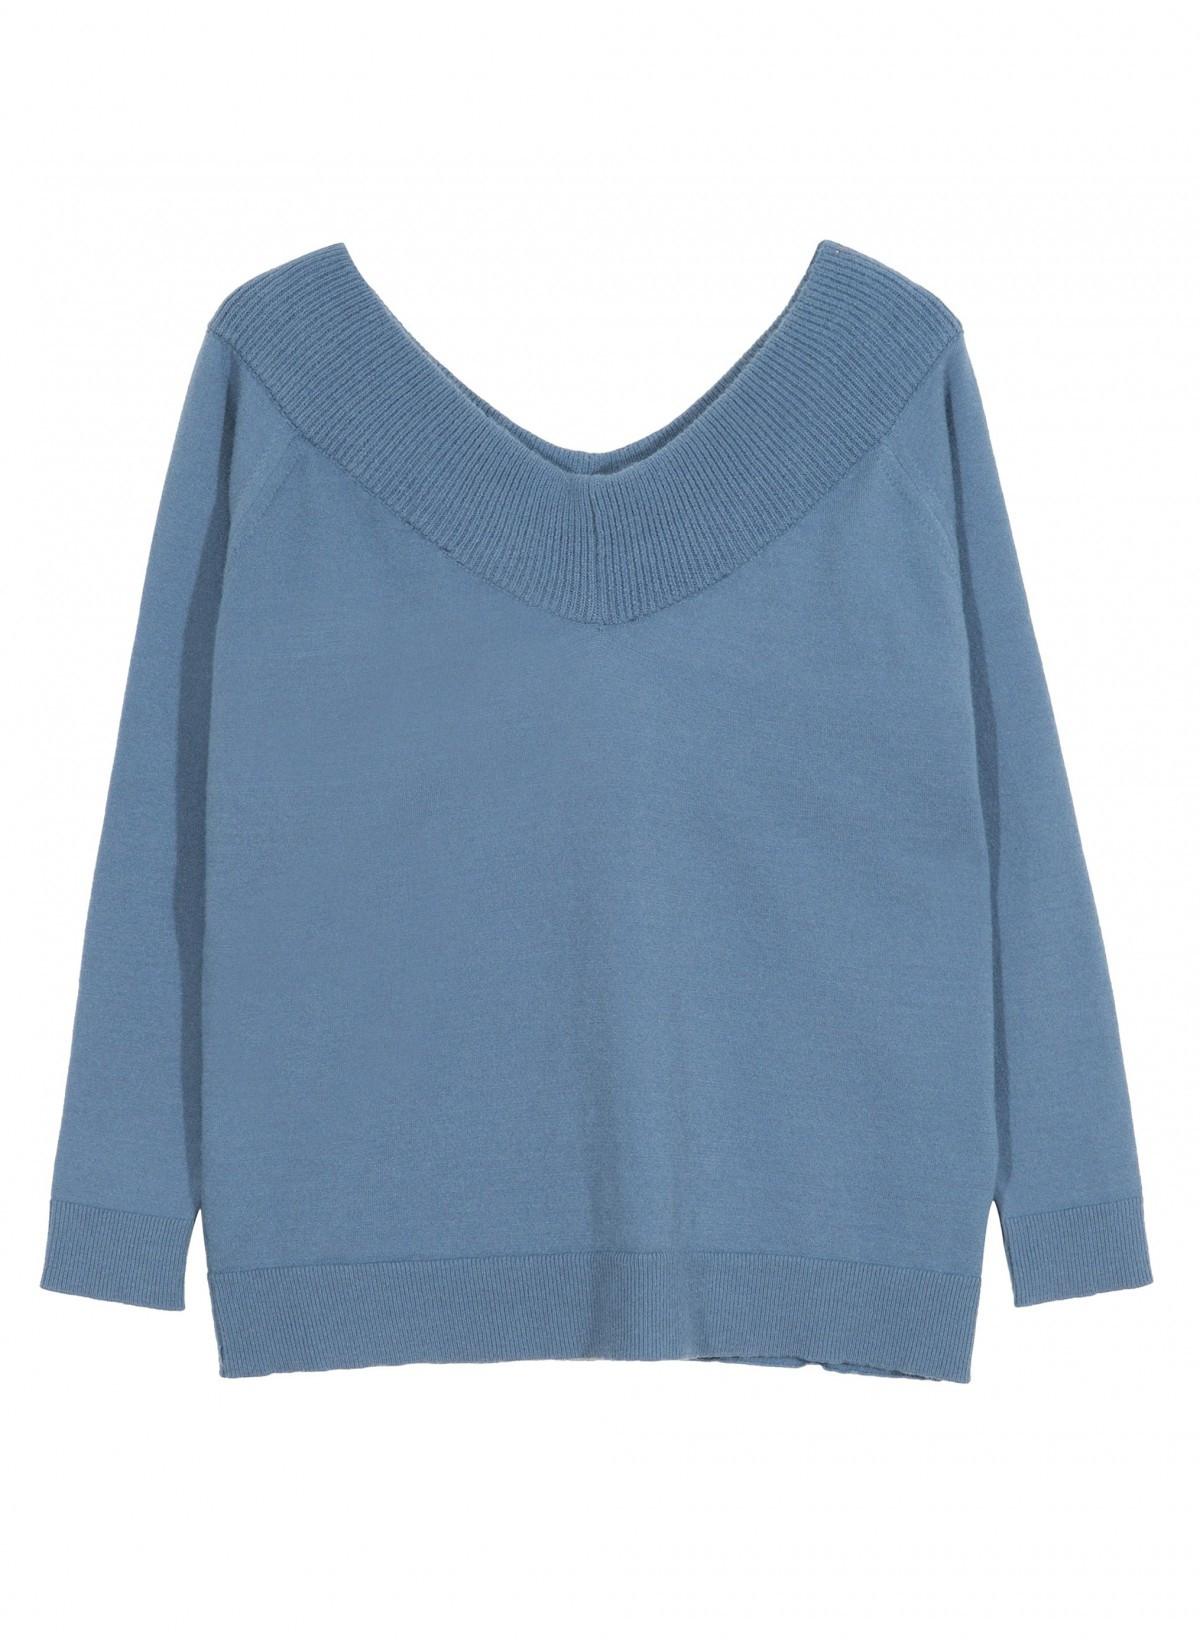 A A bluse skulder